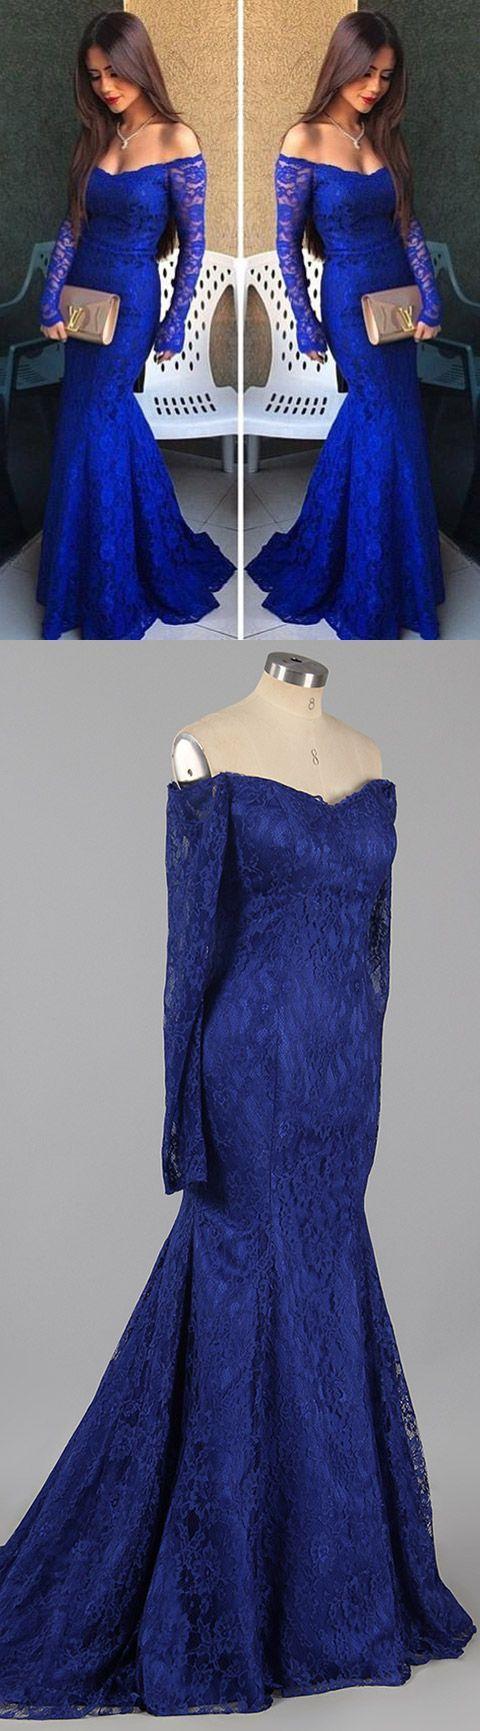 Royal blue prom dresses long lace formal dresses long sleeve hot